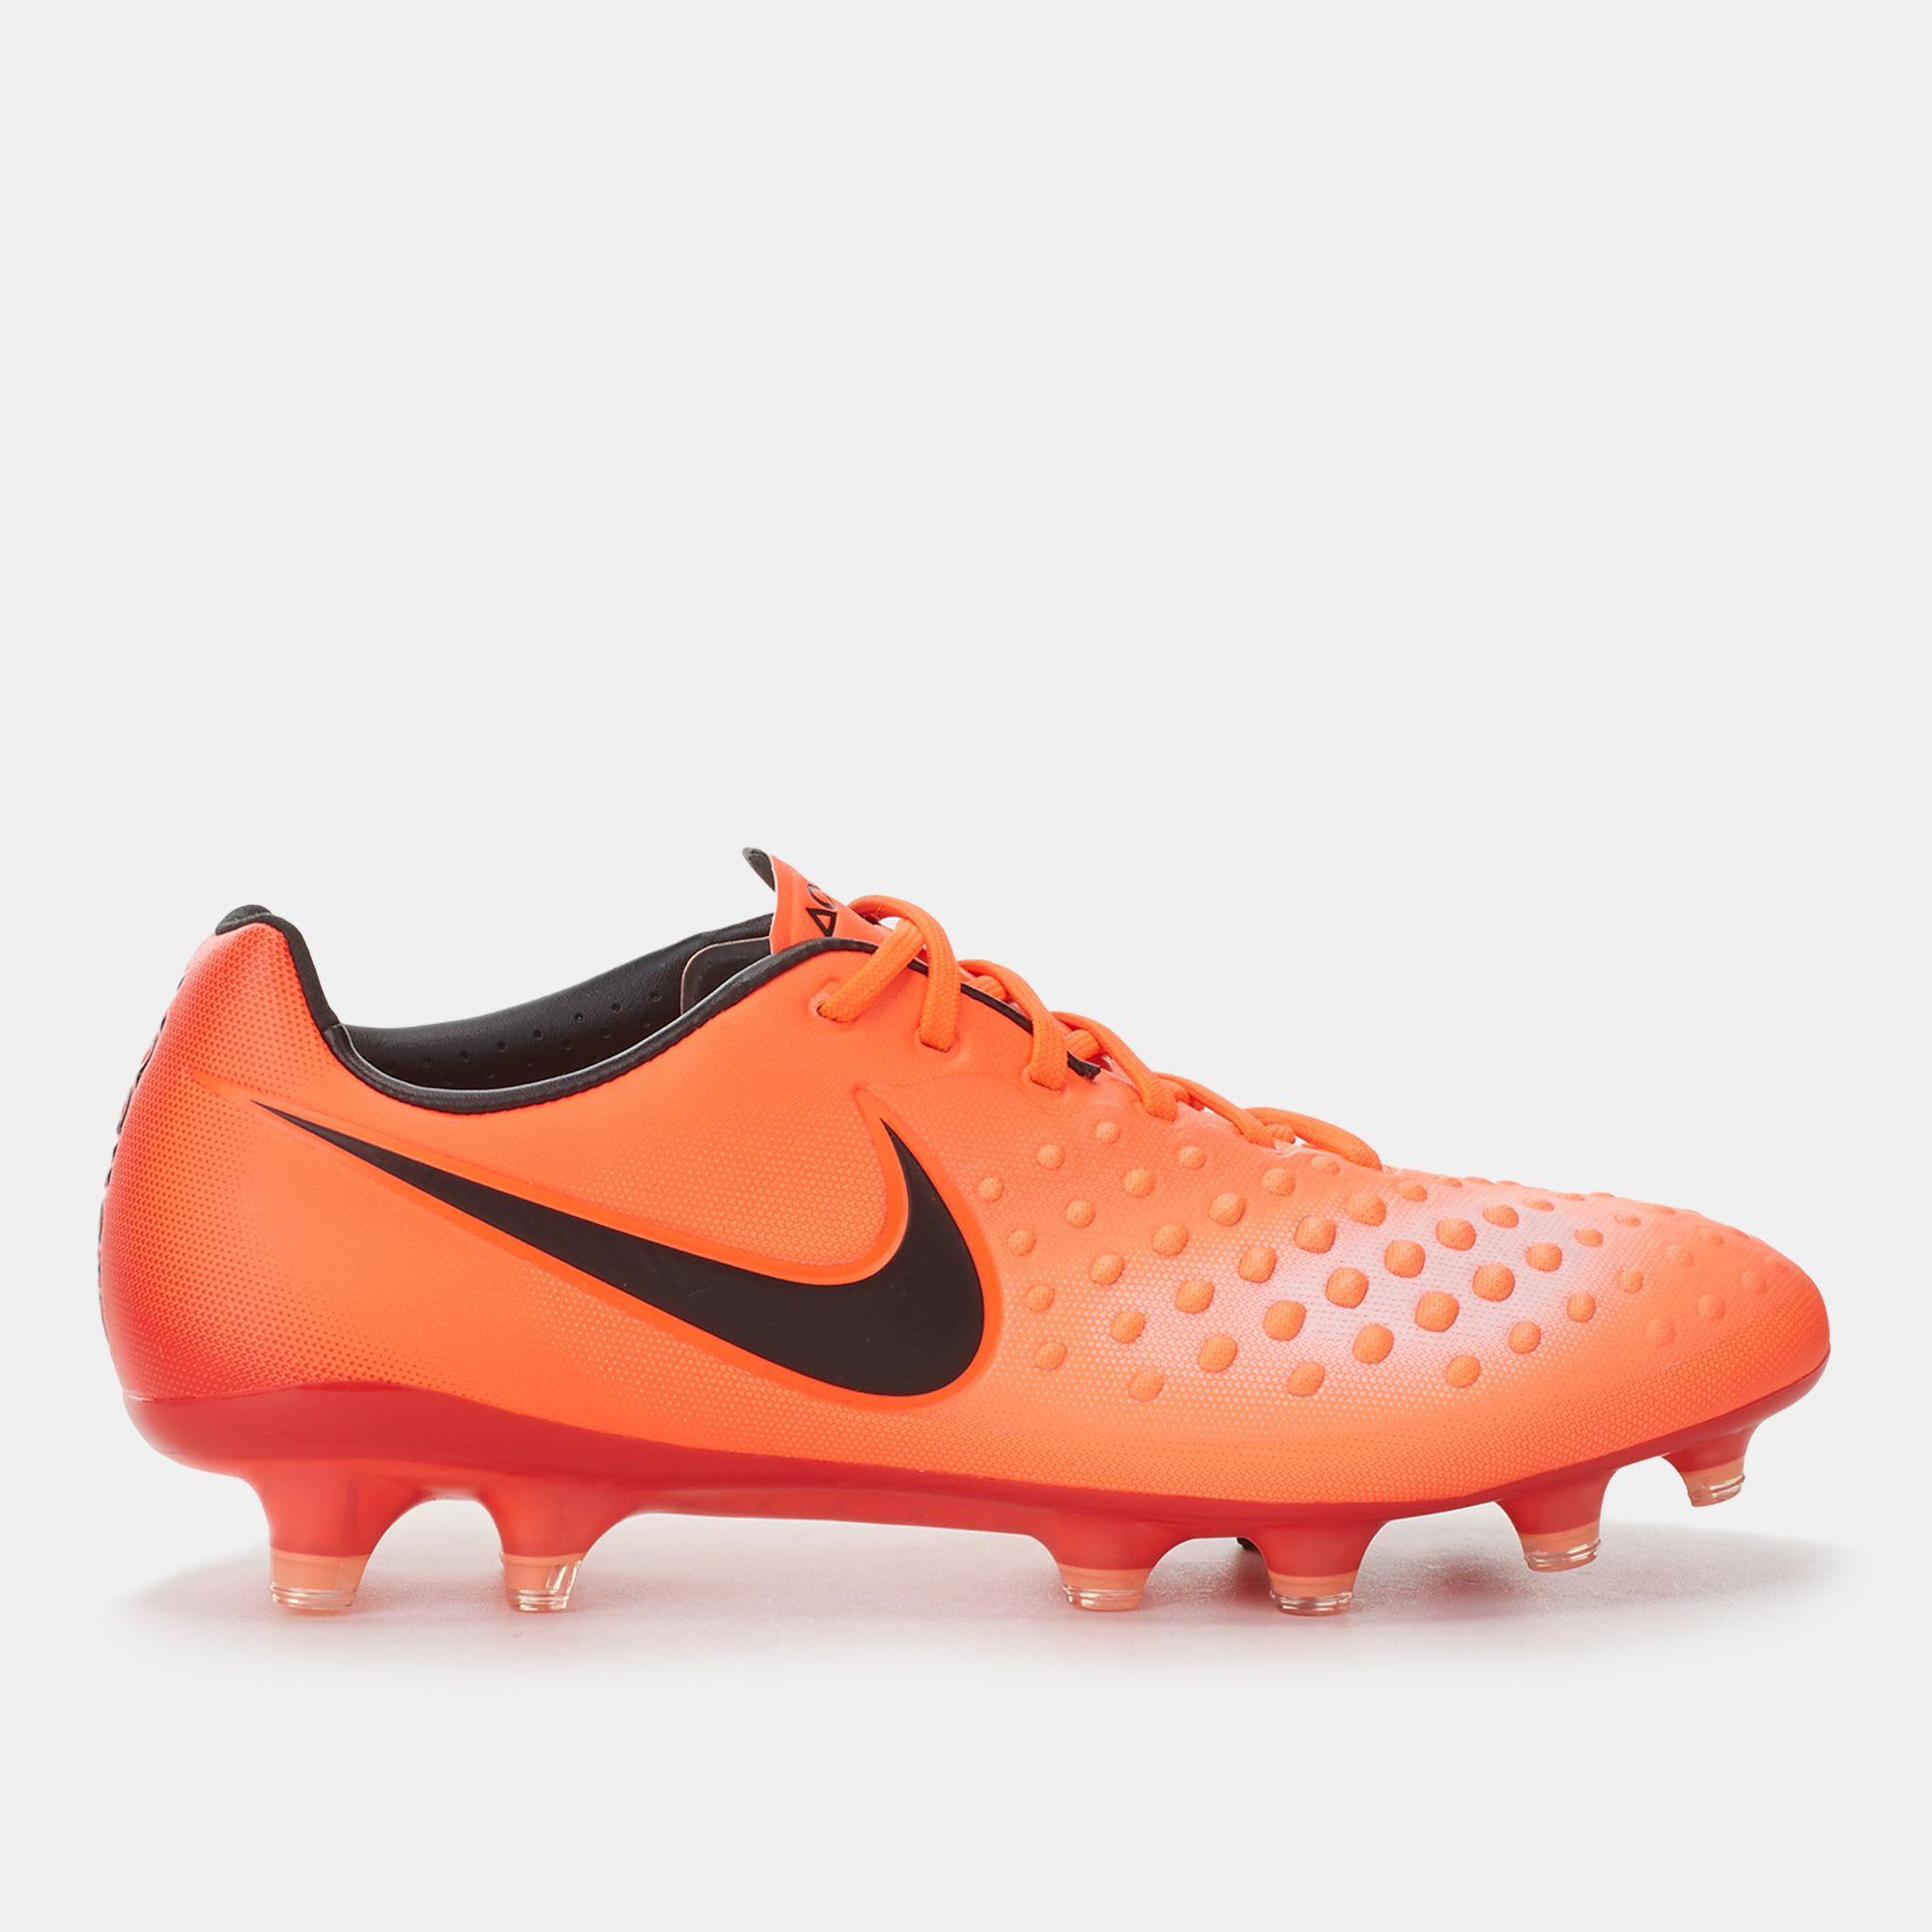 9b2b269d9a8e Nike Magista Opus II Firm Ground Football Shoe | Football Shoes ...